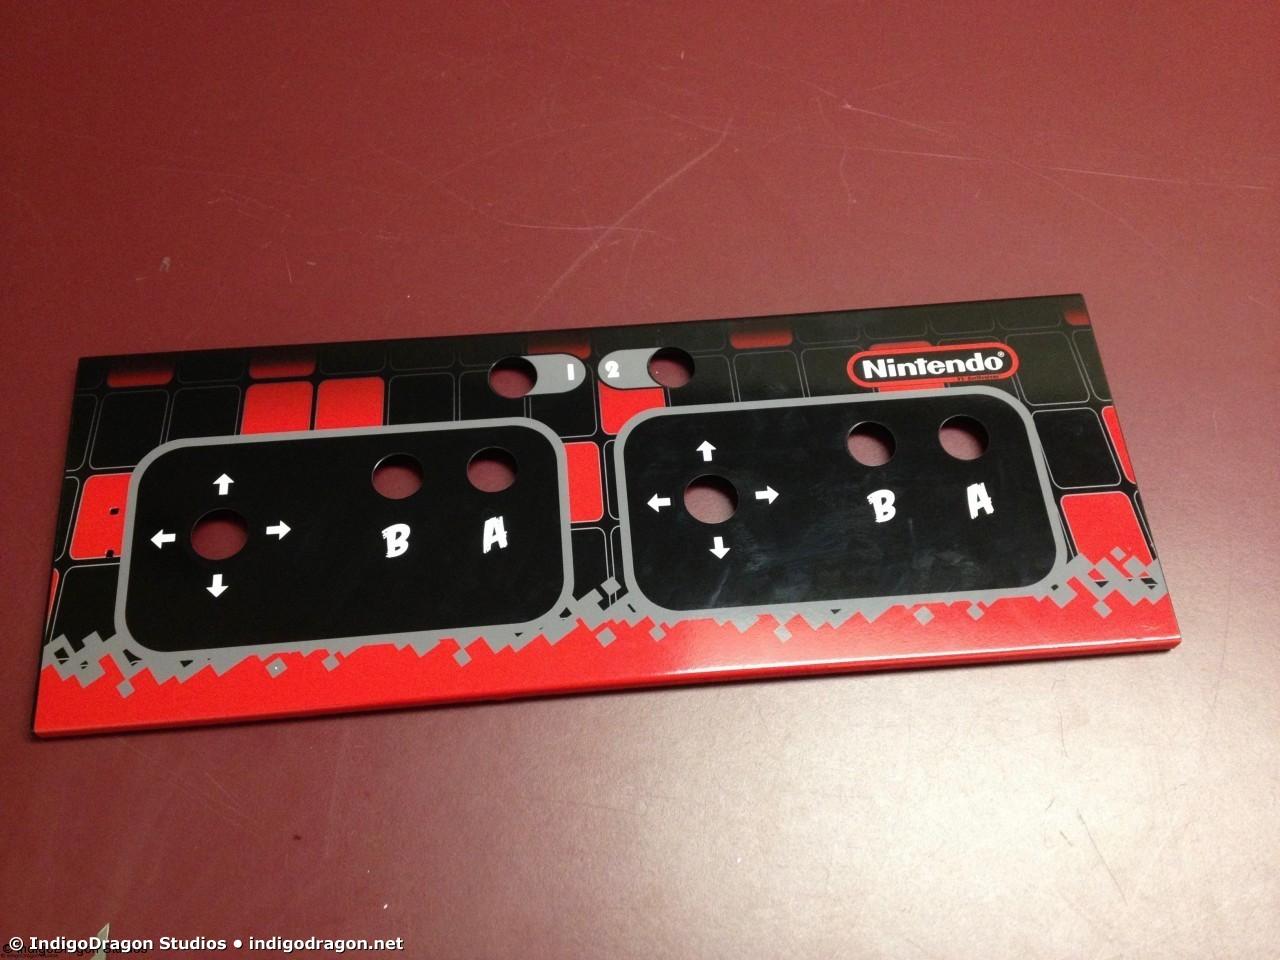 NES Emulator Build 28